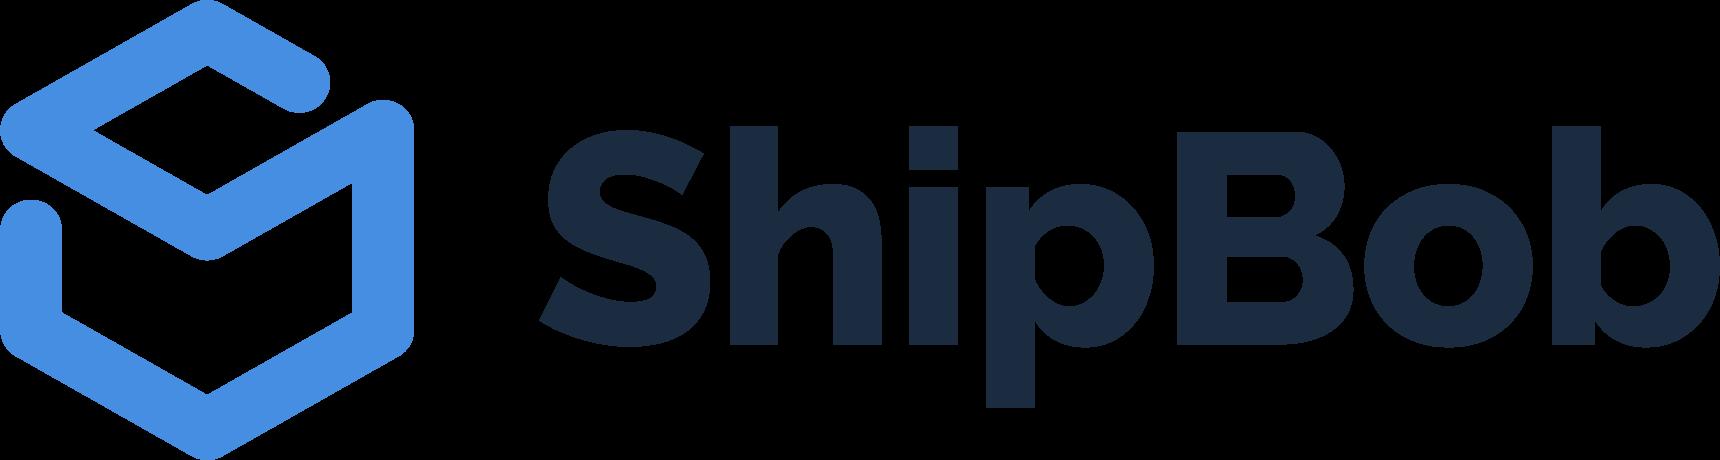 Ship_bob